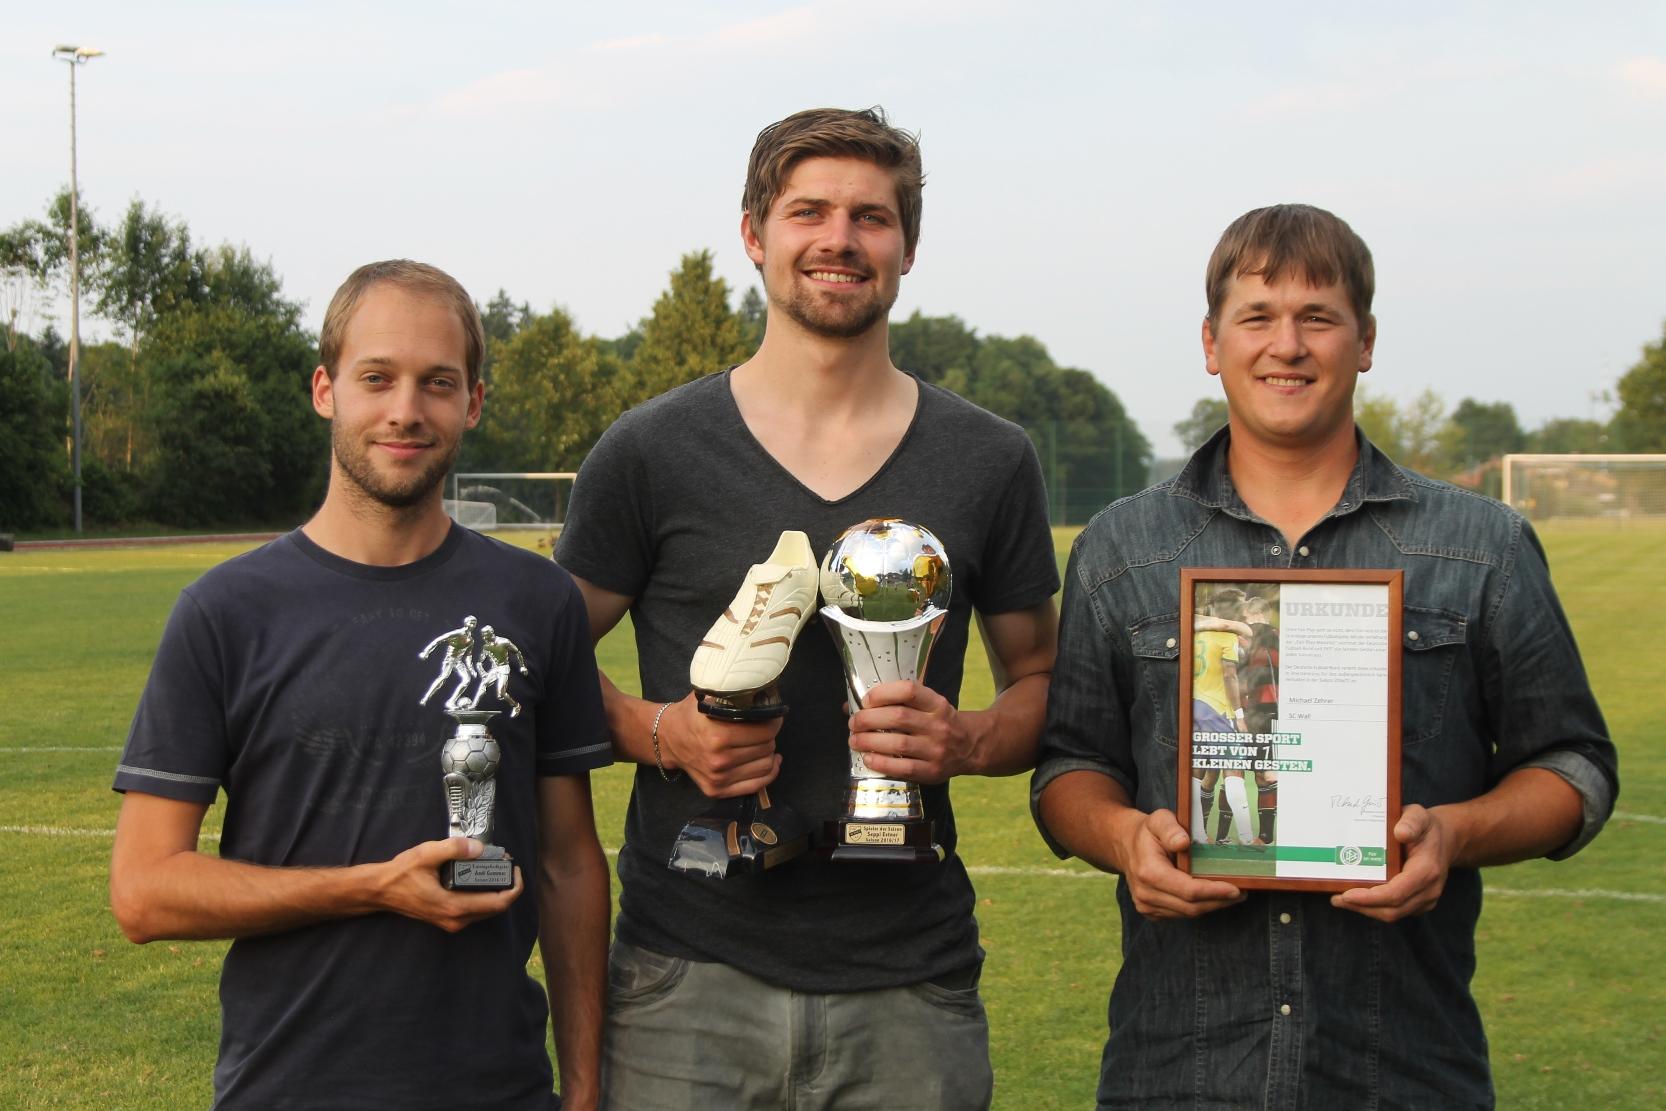 Spieler der Saison - Sonderpreis Fair Play 2017